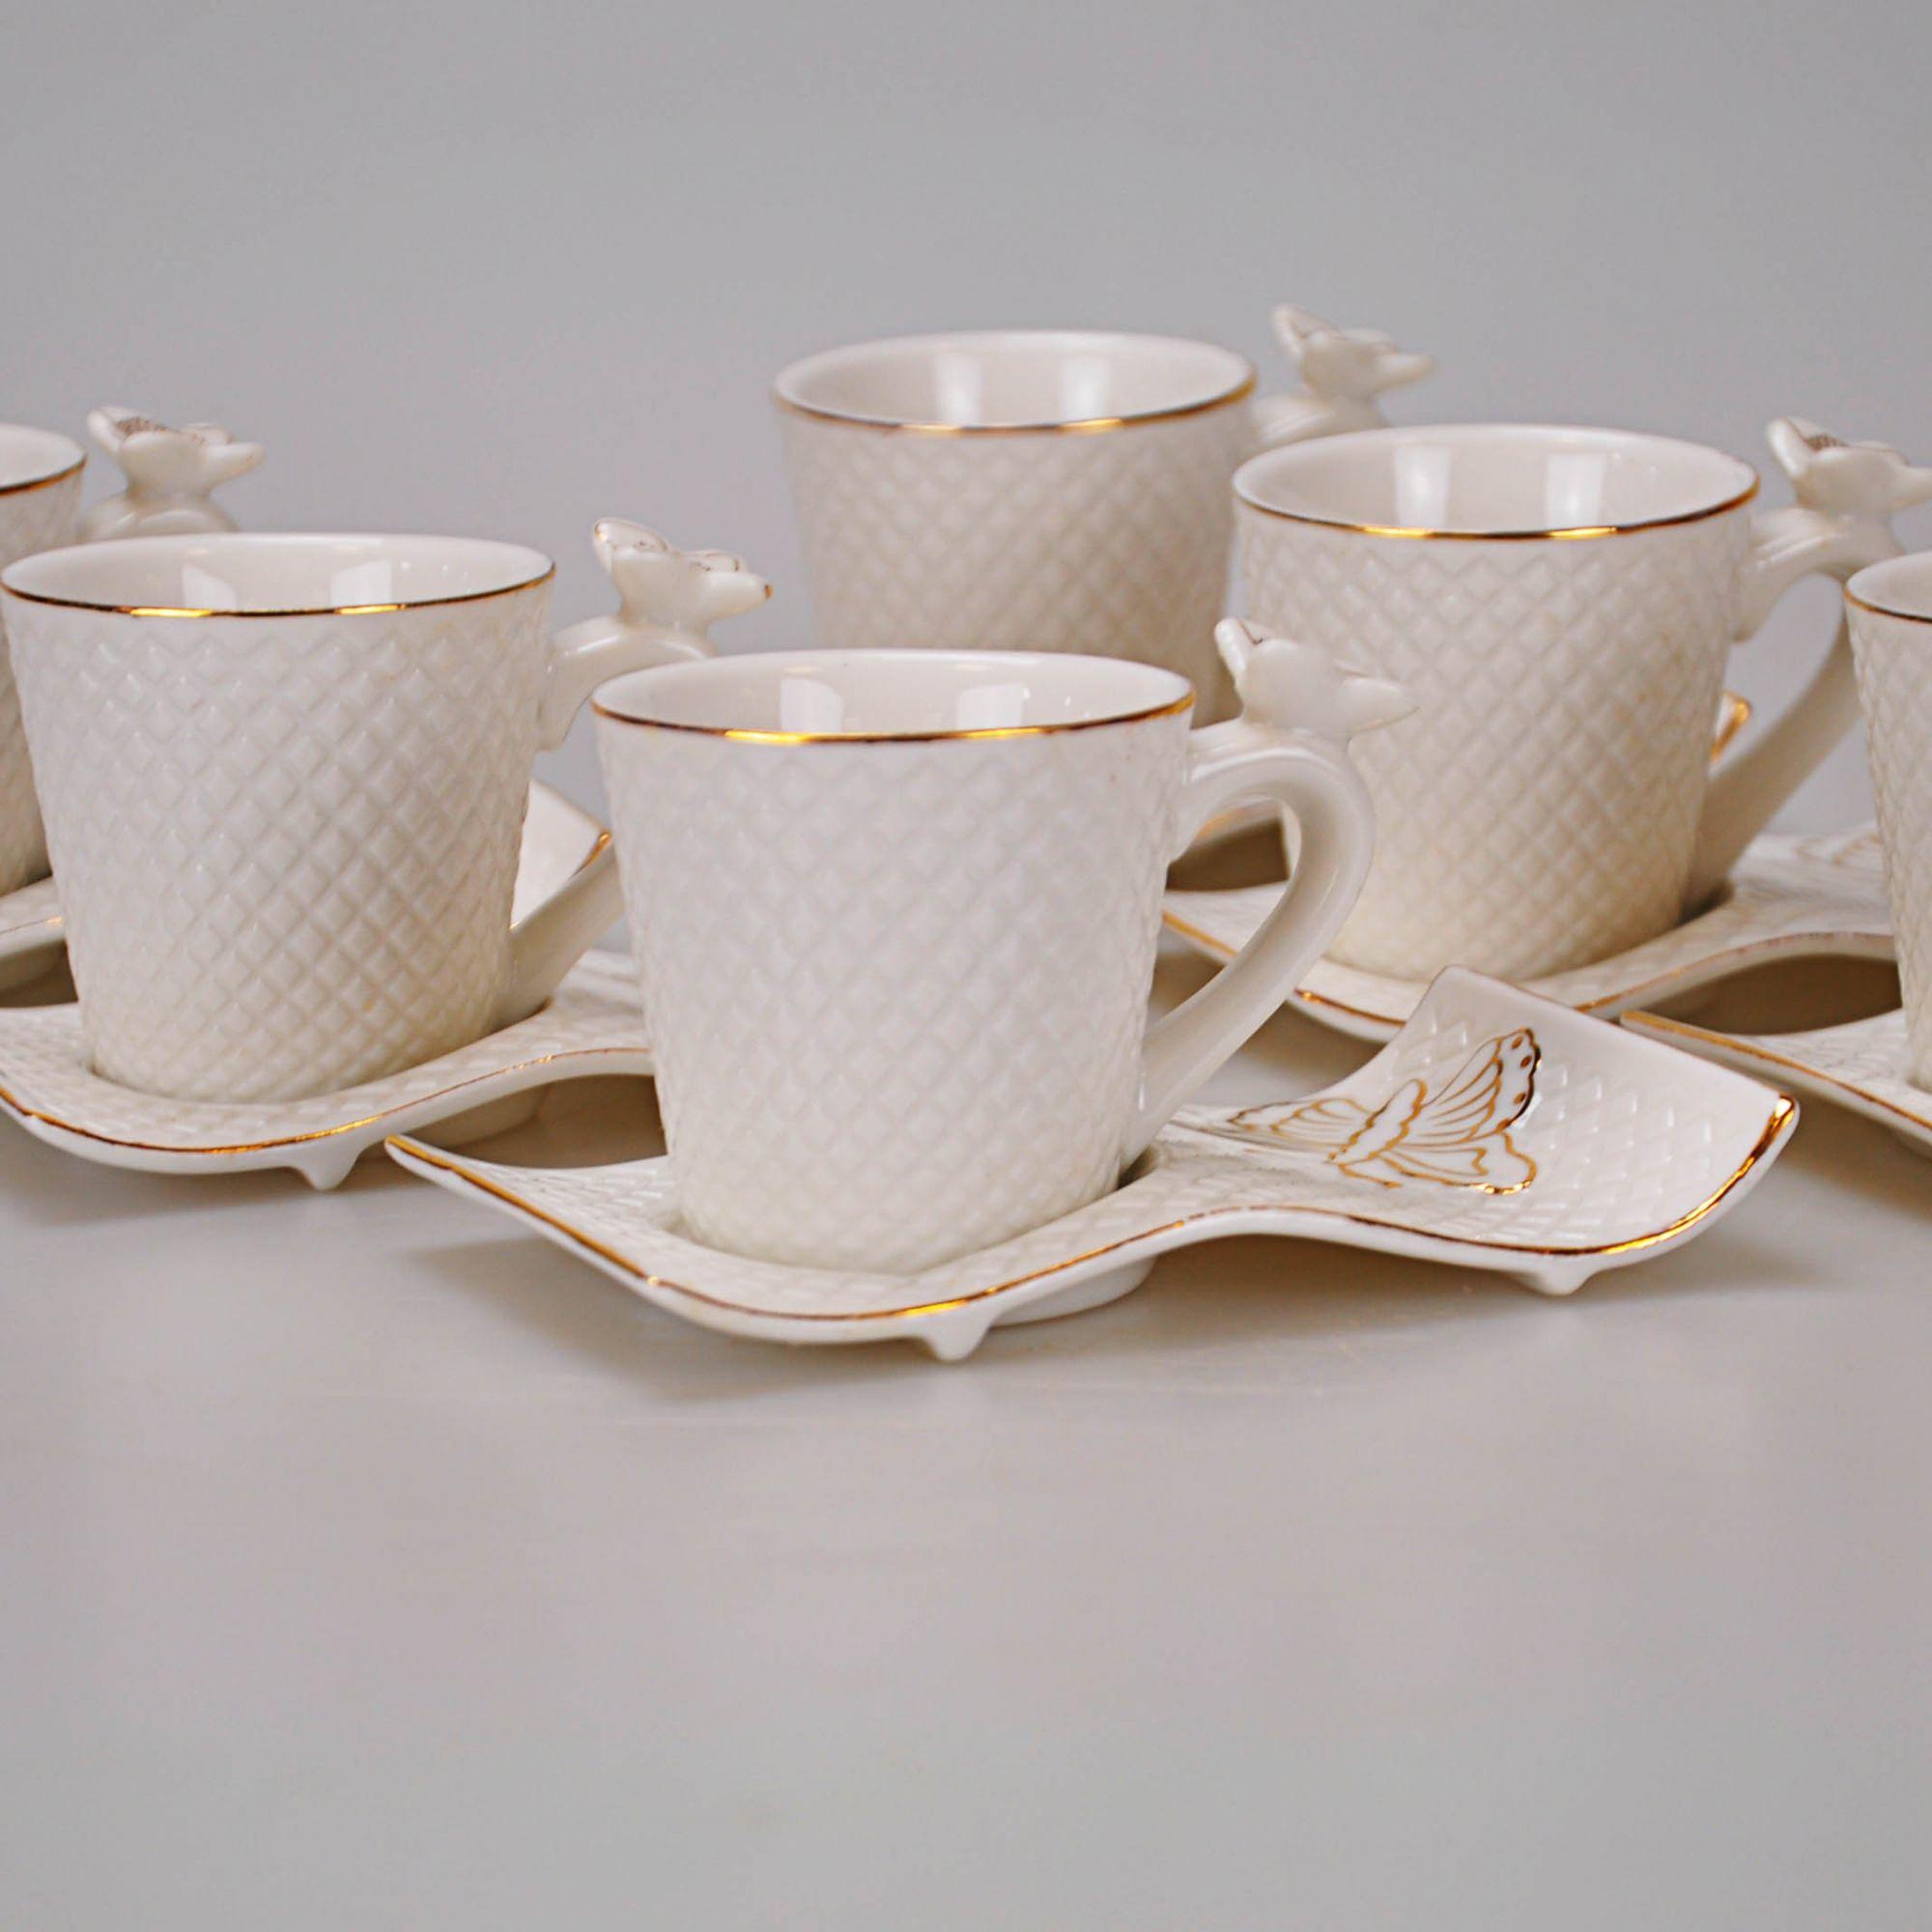 Jogo Chá Branco 5,5 X 5,5 cm borboletas (12 PEÇAS)